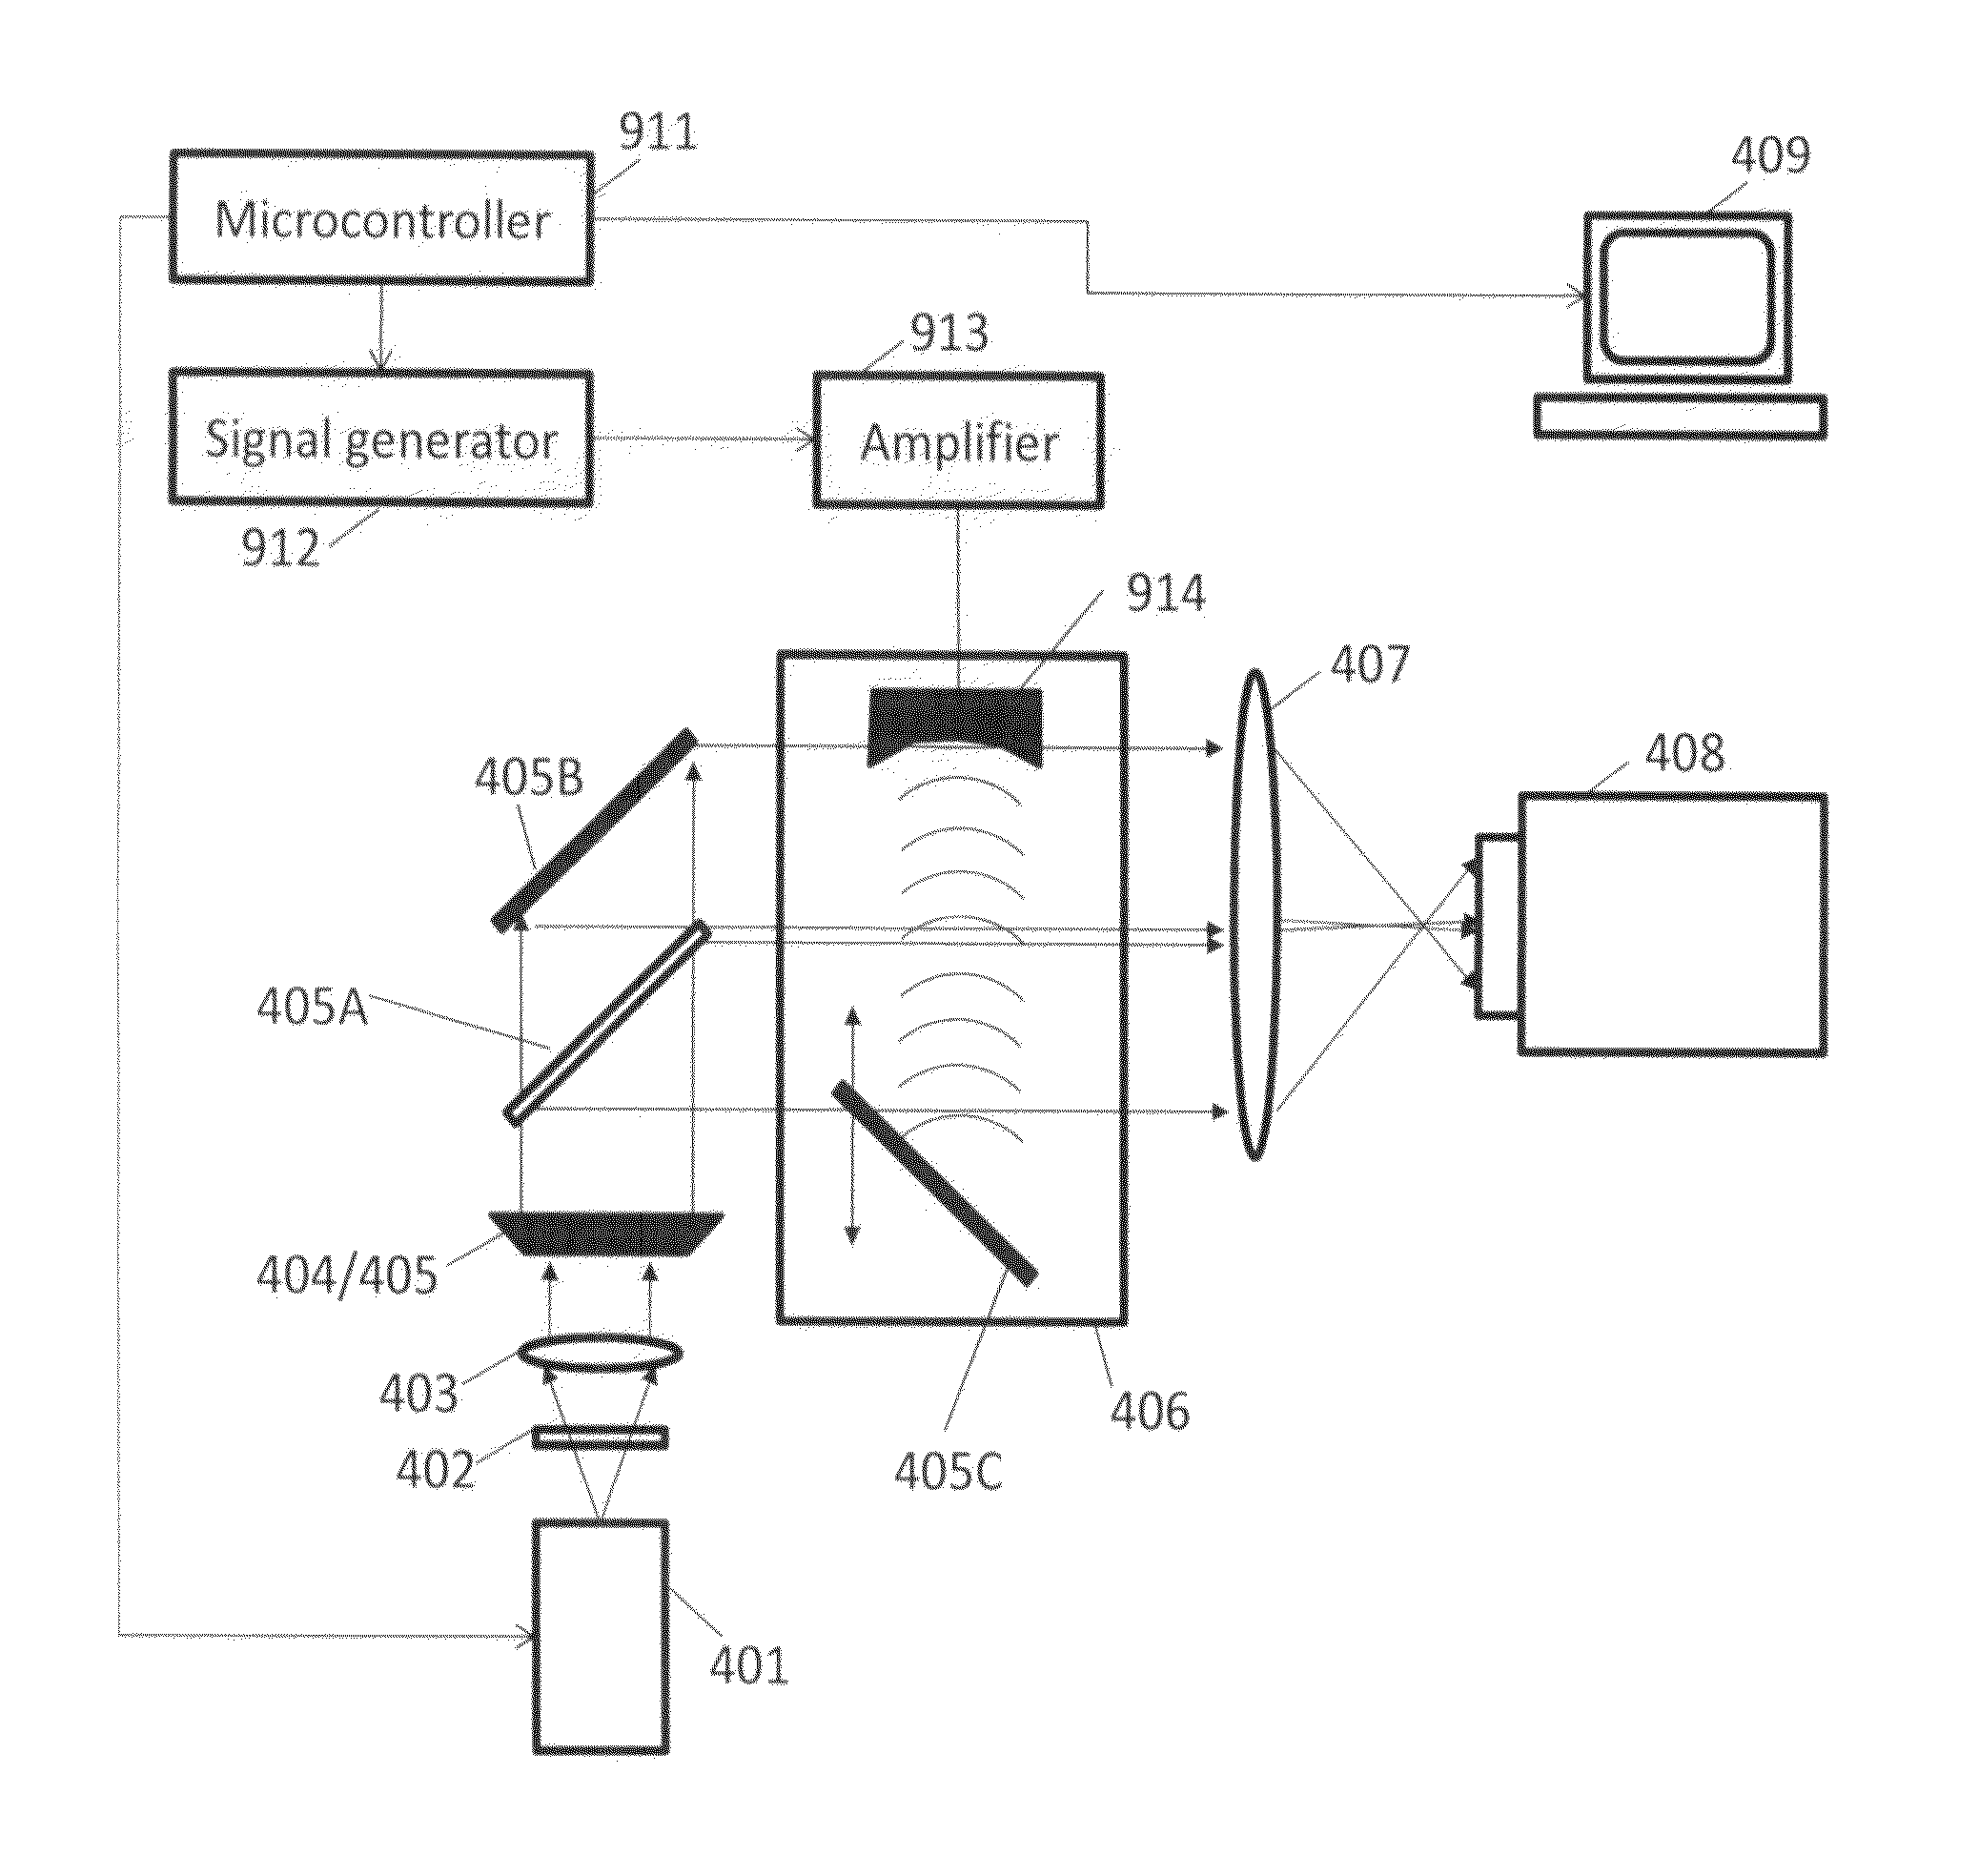 microcontroller signal generator version 2